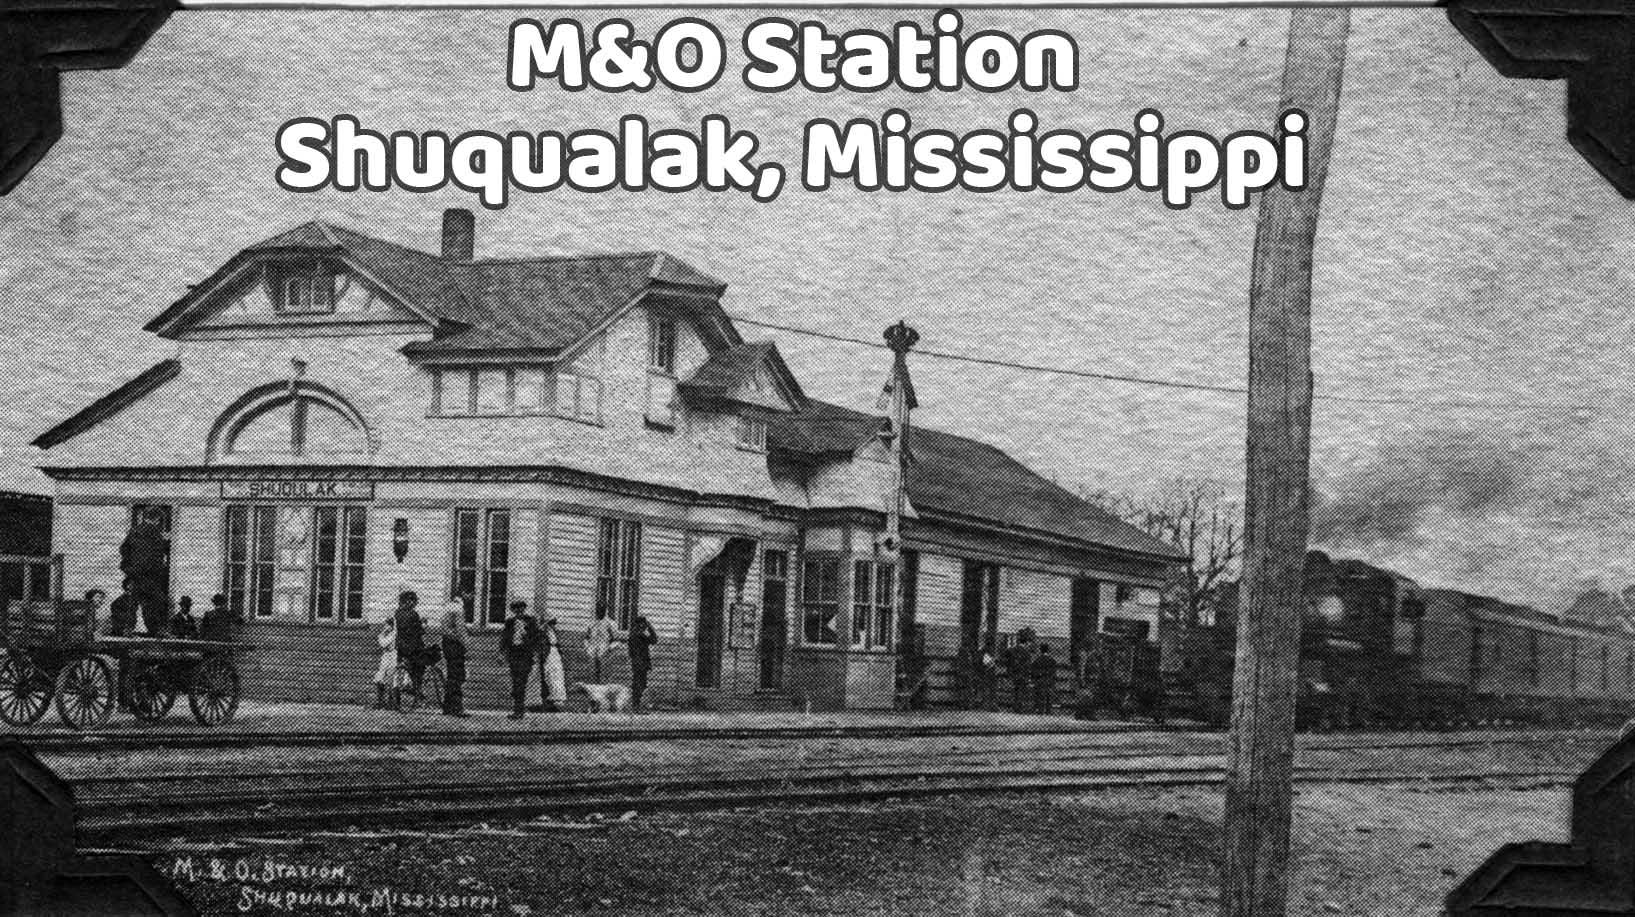 M & O Rail Station in Shuqualak, Mississippi